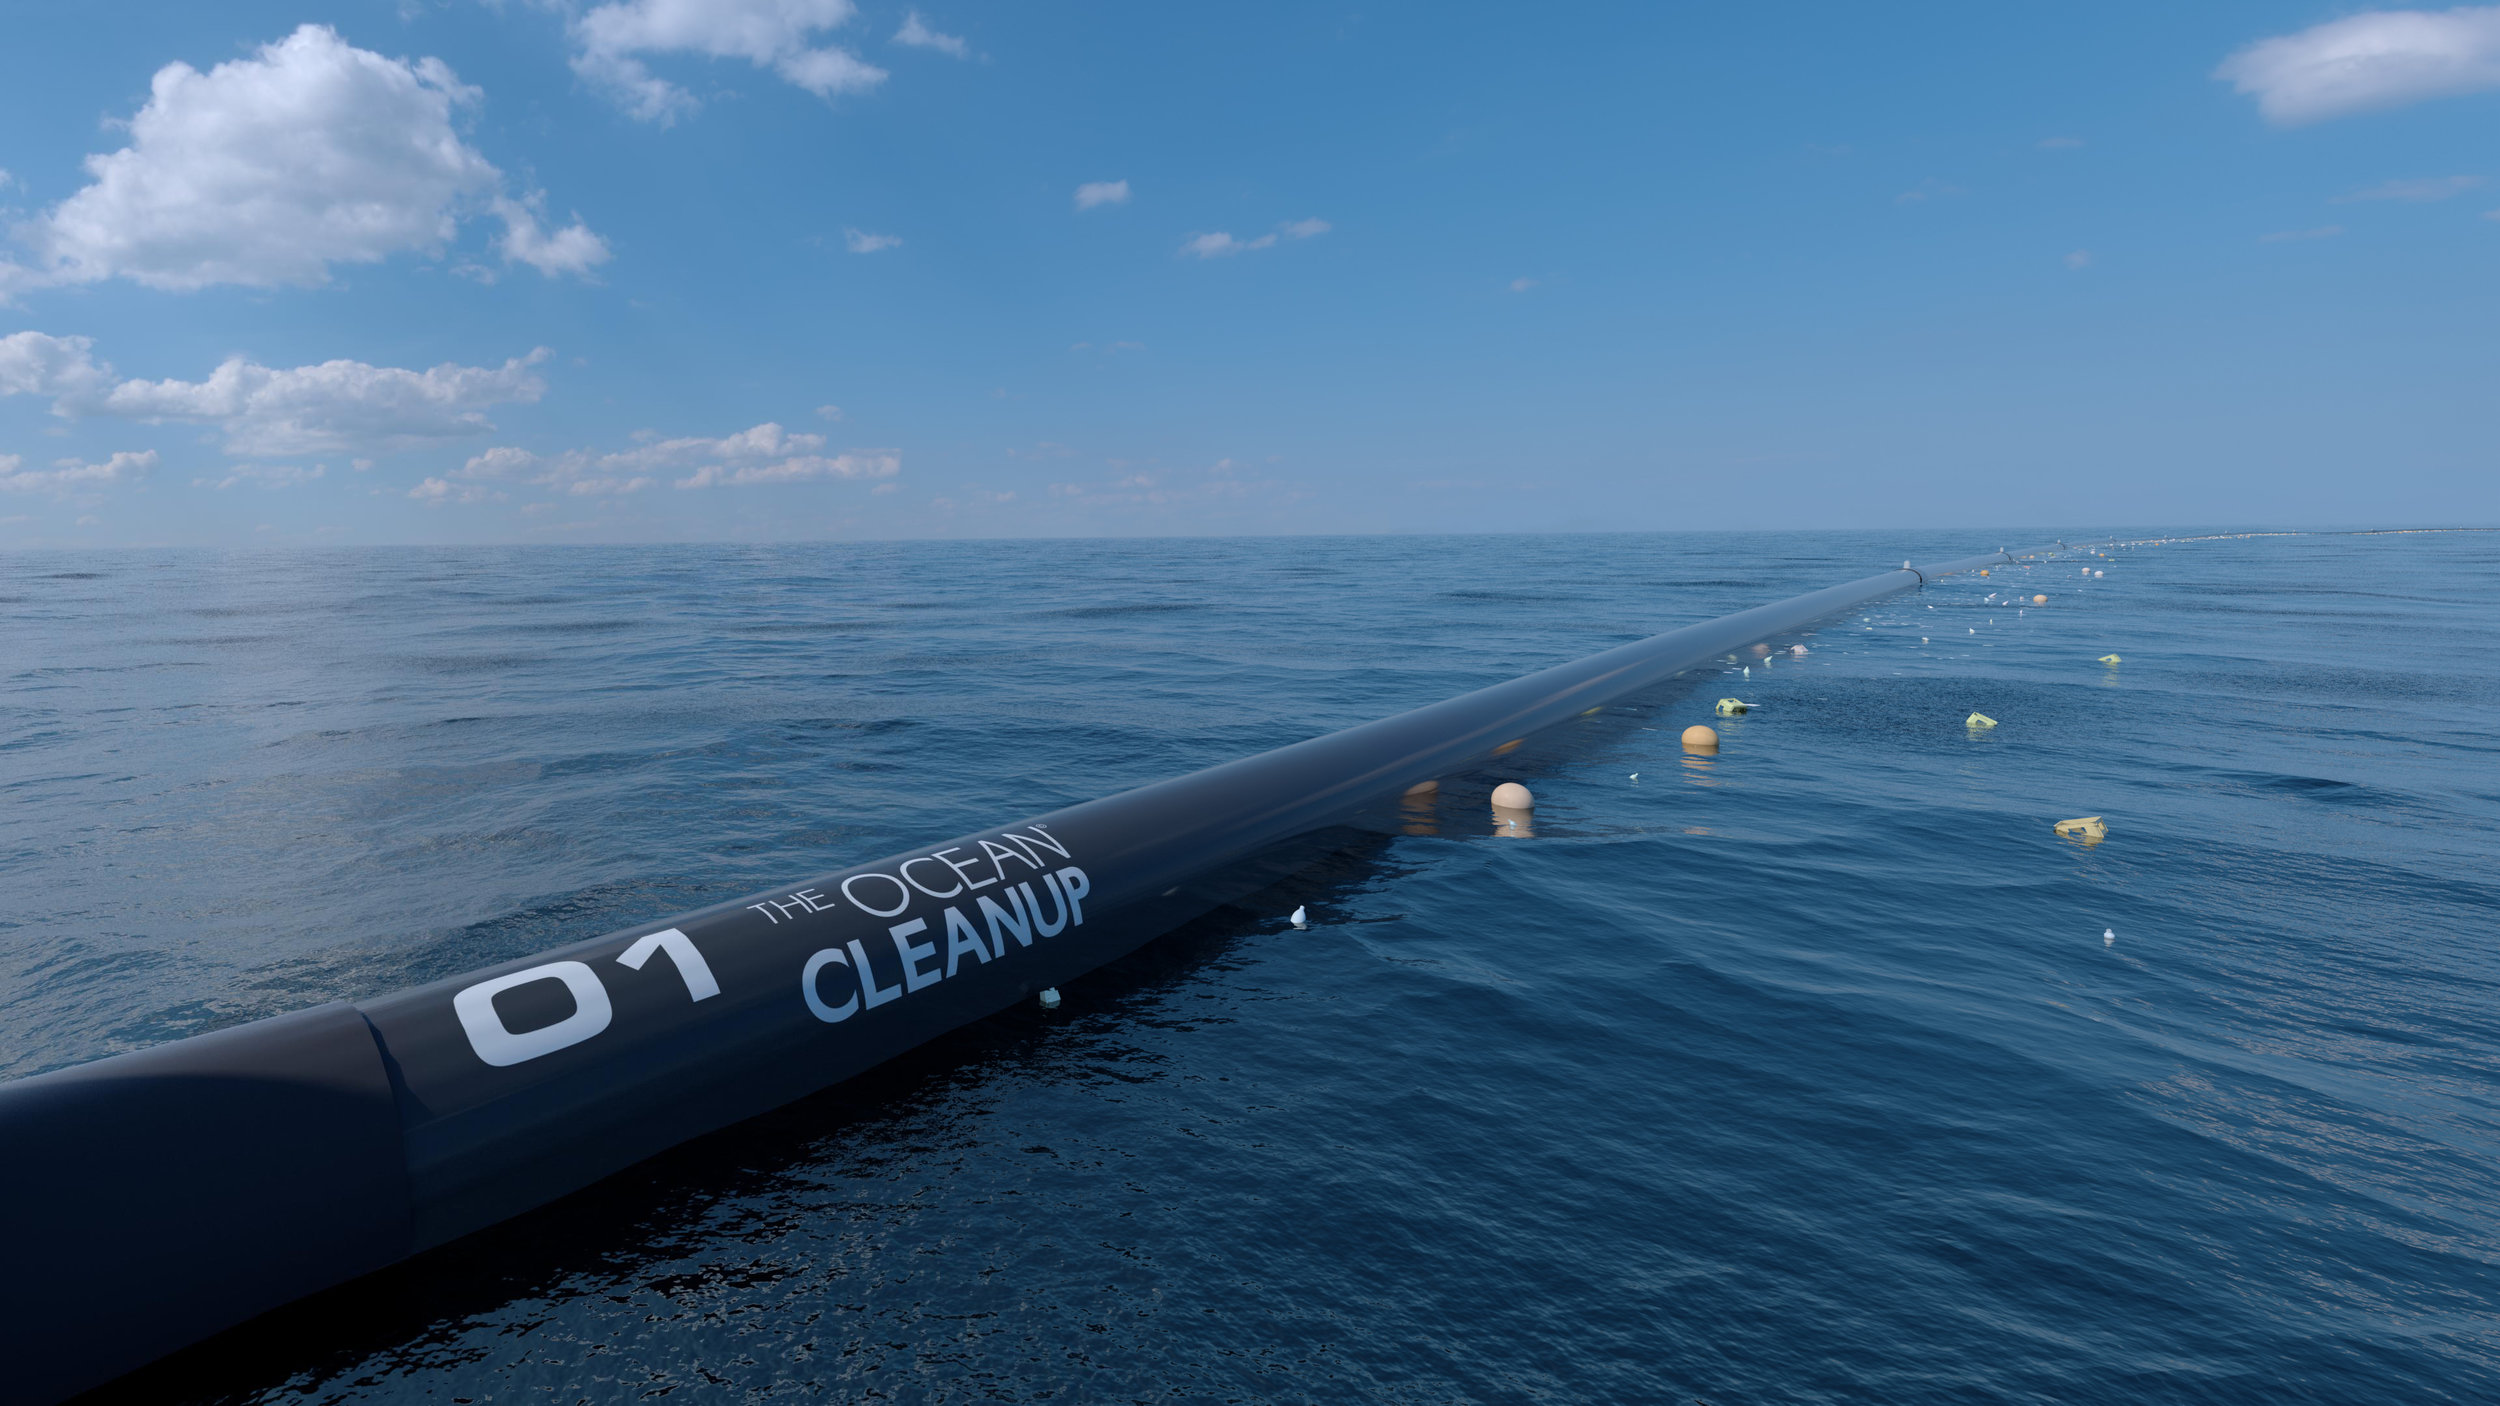 Credits: Erwin Zwart / The Ocean Cleanup